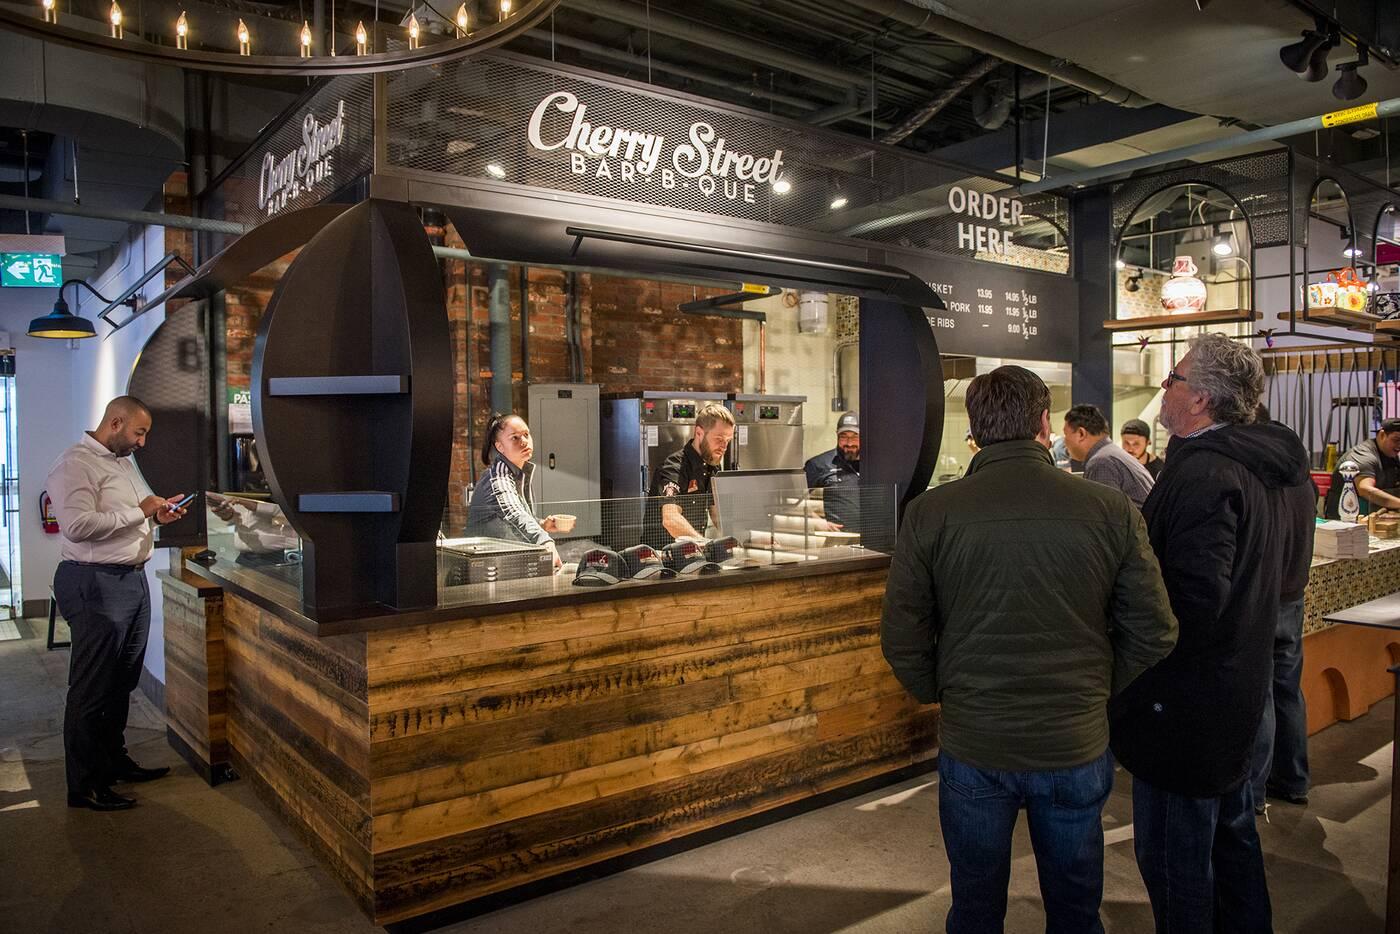 cherry street bar-b-que toronto